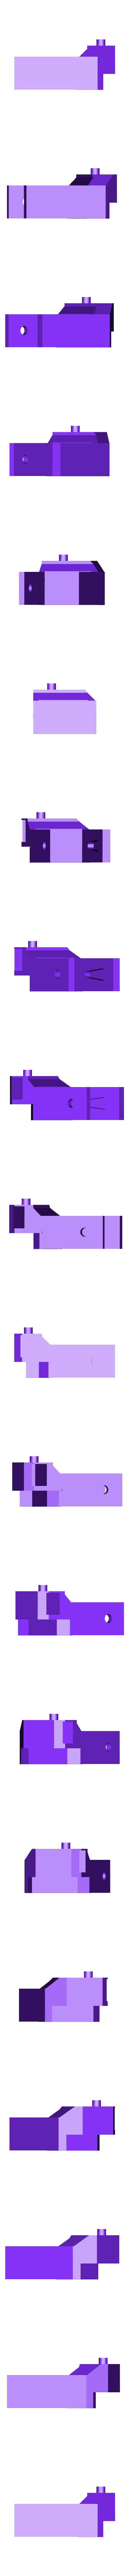 Leg_R_Bottom.stl Download free STL file Quadruped Walker Robot • 3D print object, indigo4